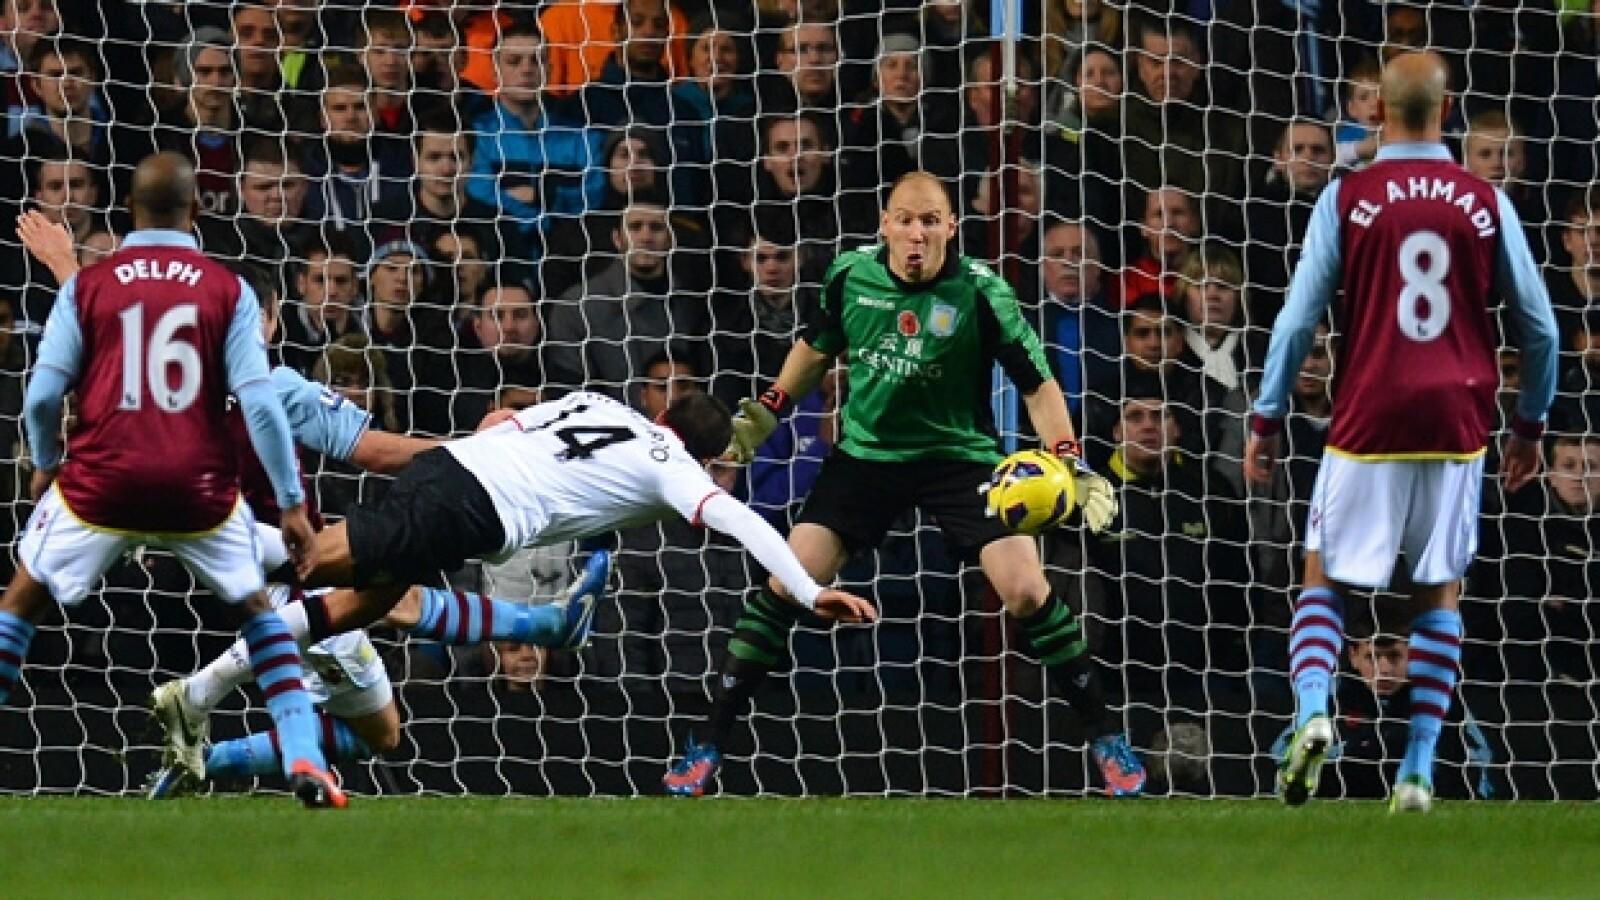 Chicharito goles vs. Aston Villa 1